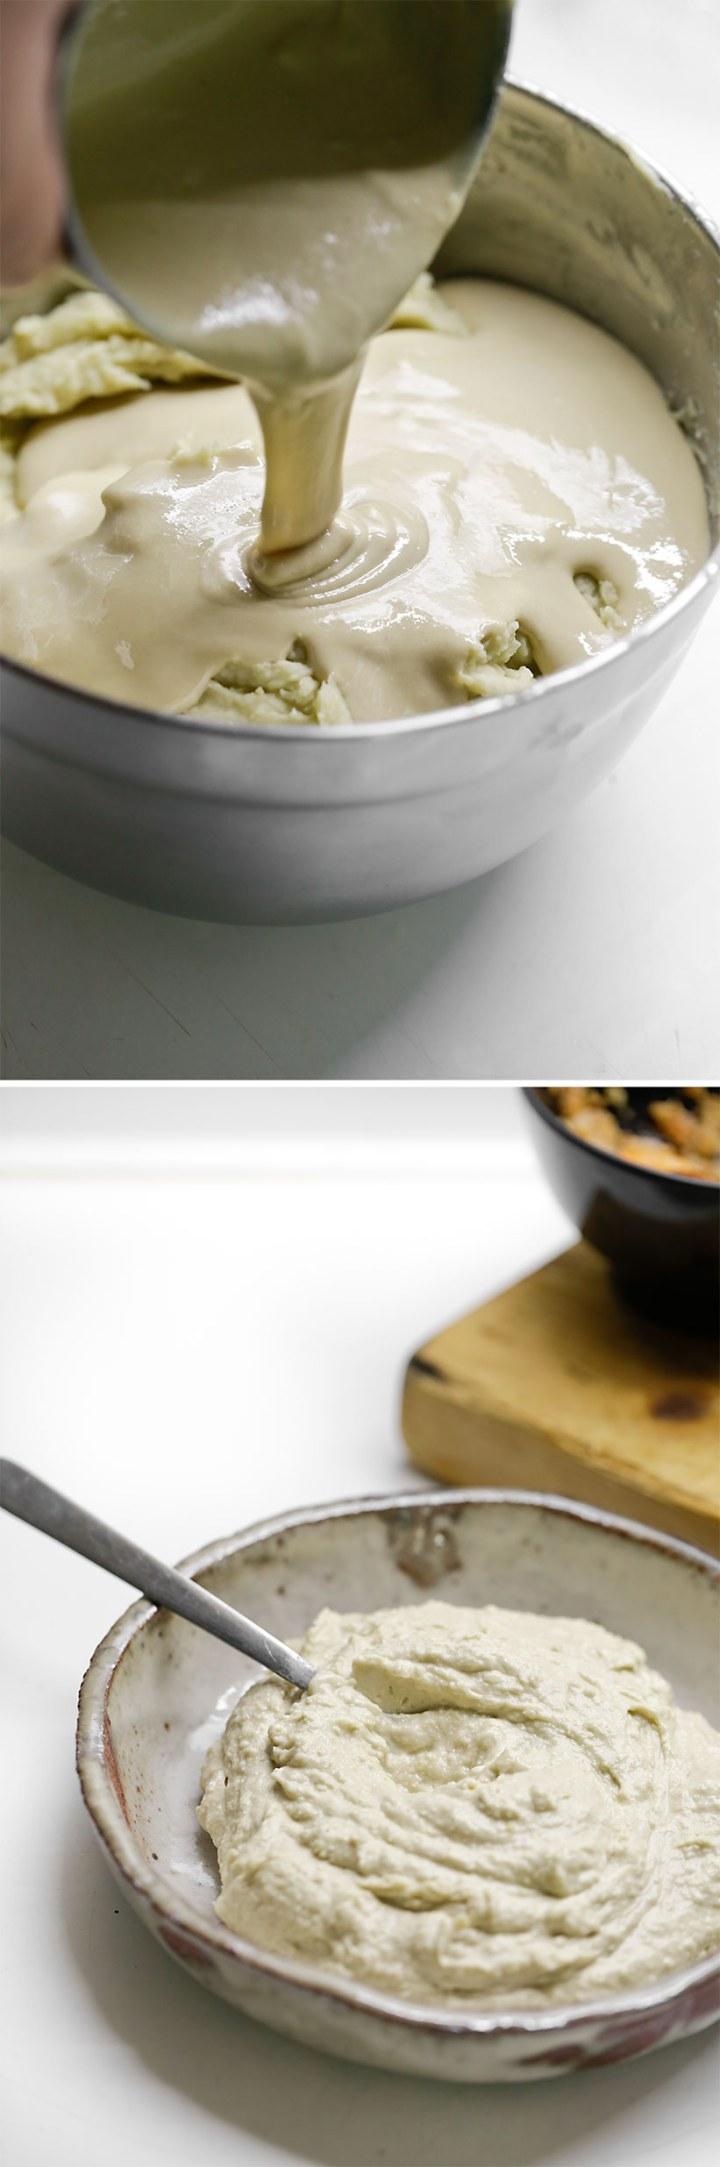 Receta de puré de verdinas con langostinos i